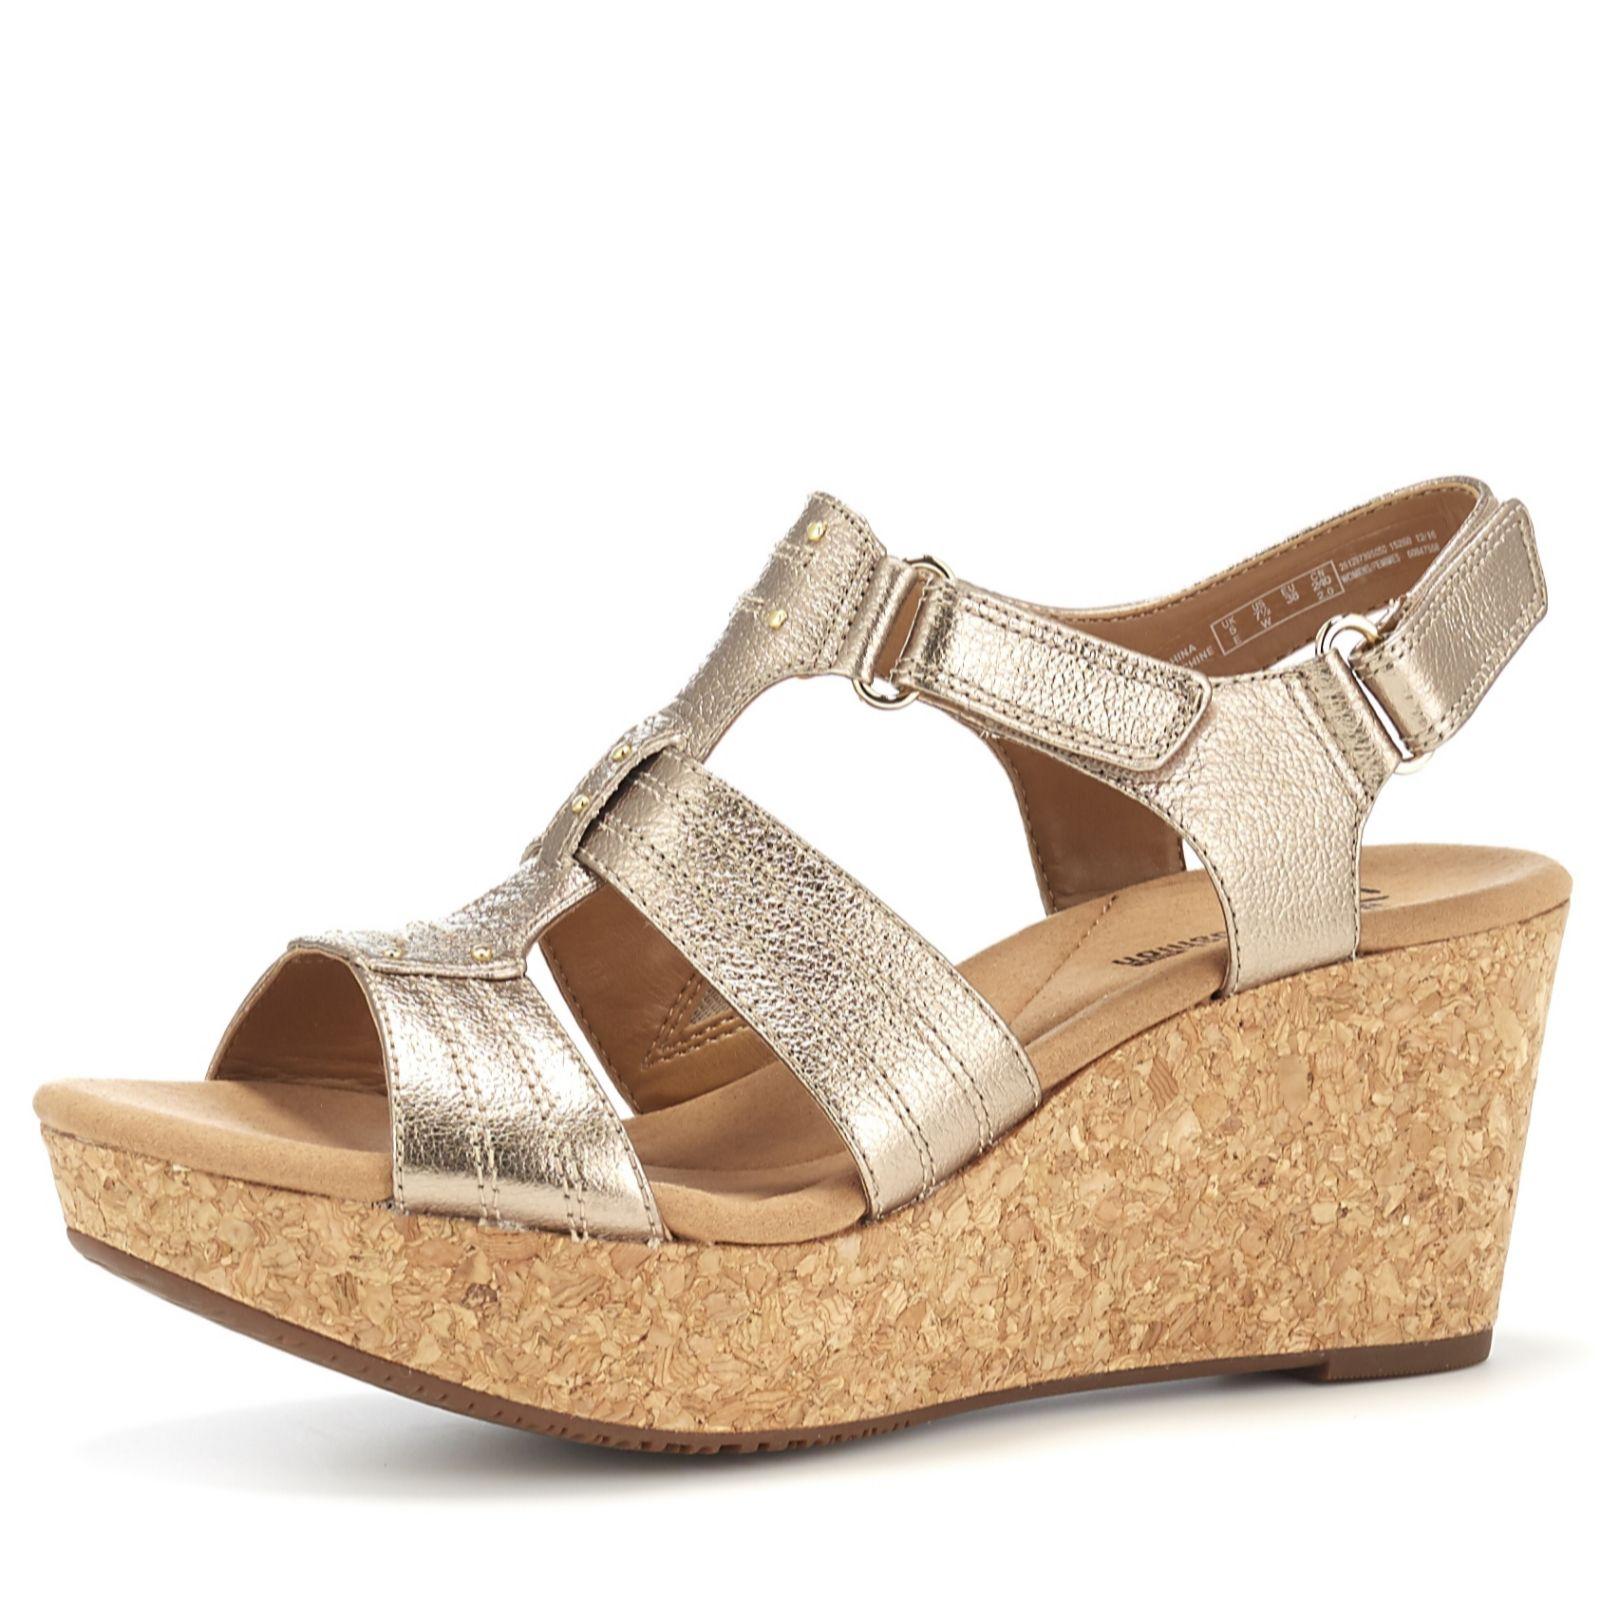 025318f9ea7 Clarks Annadel Orchid Cushion Soft Wedge Sandal Wide Fit - QVC UK